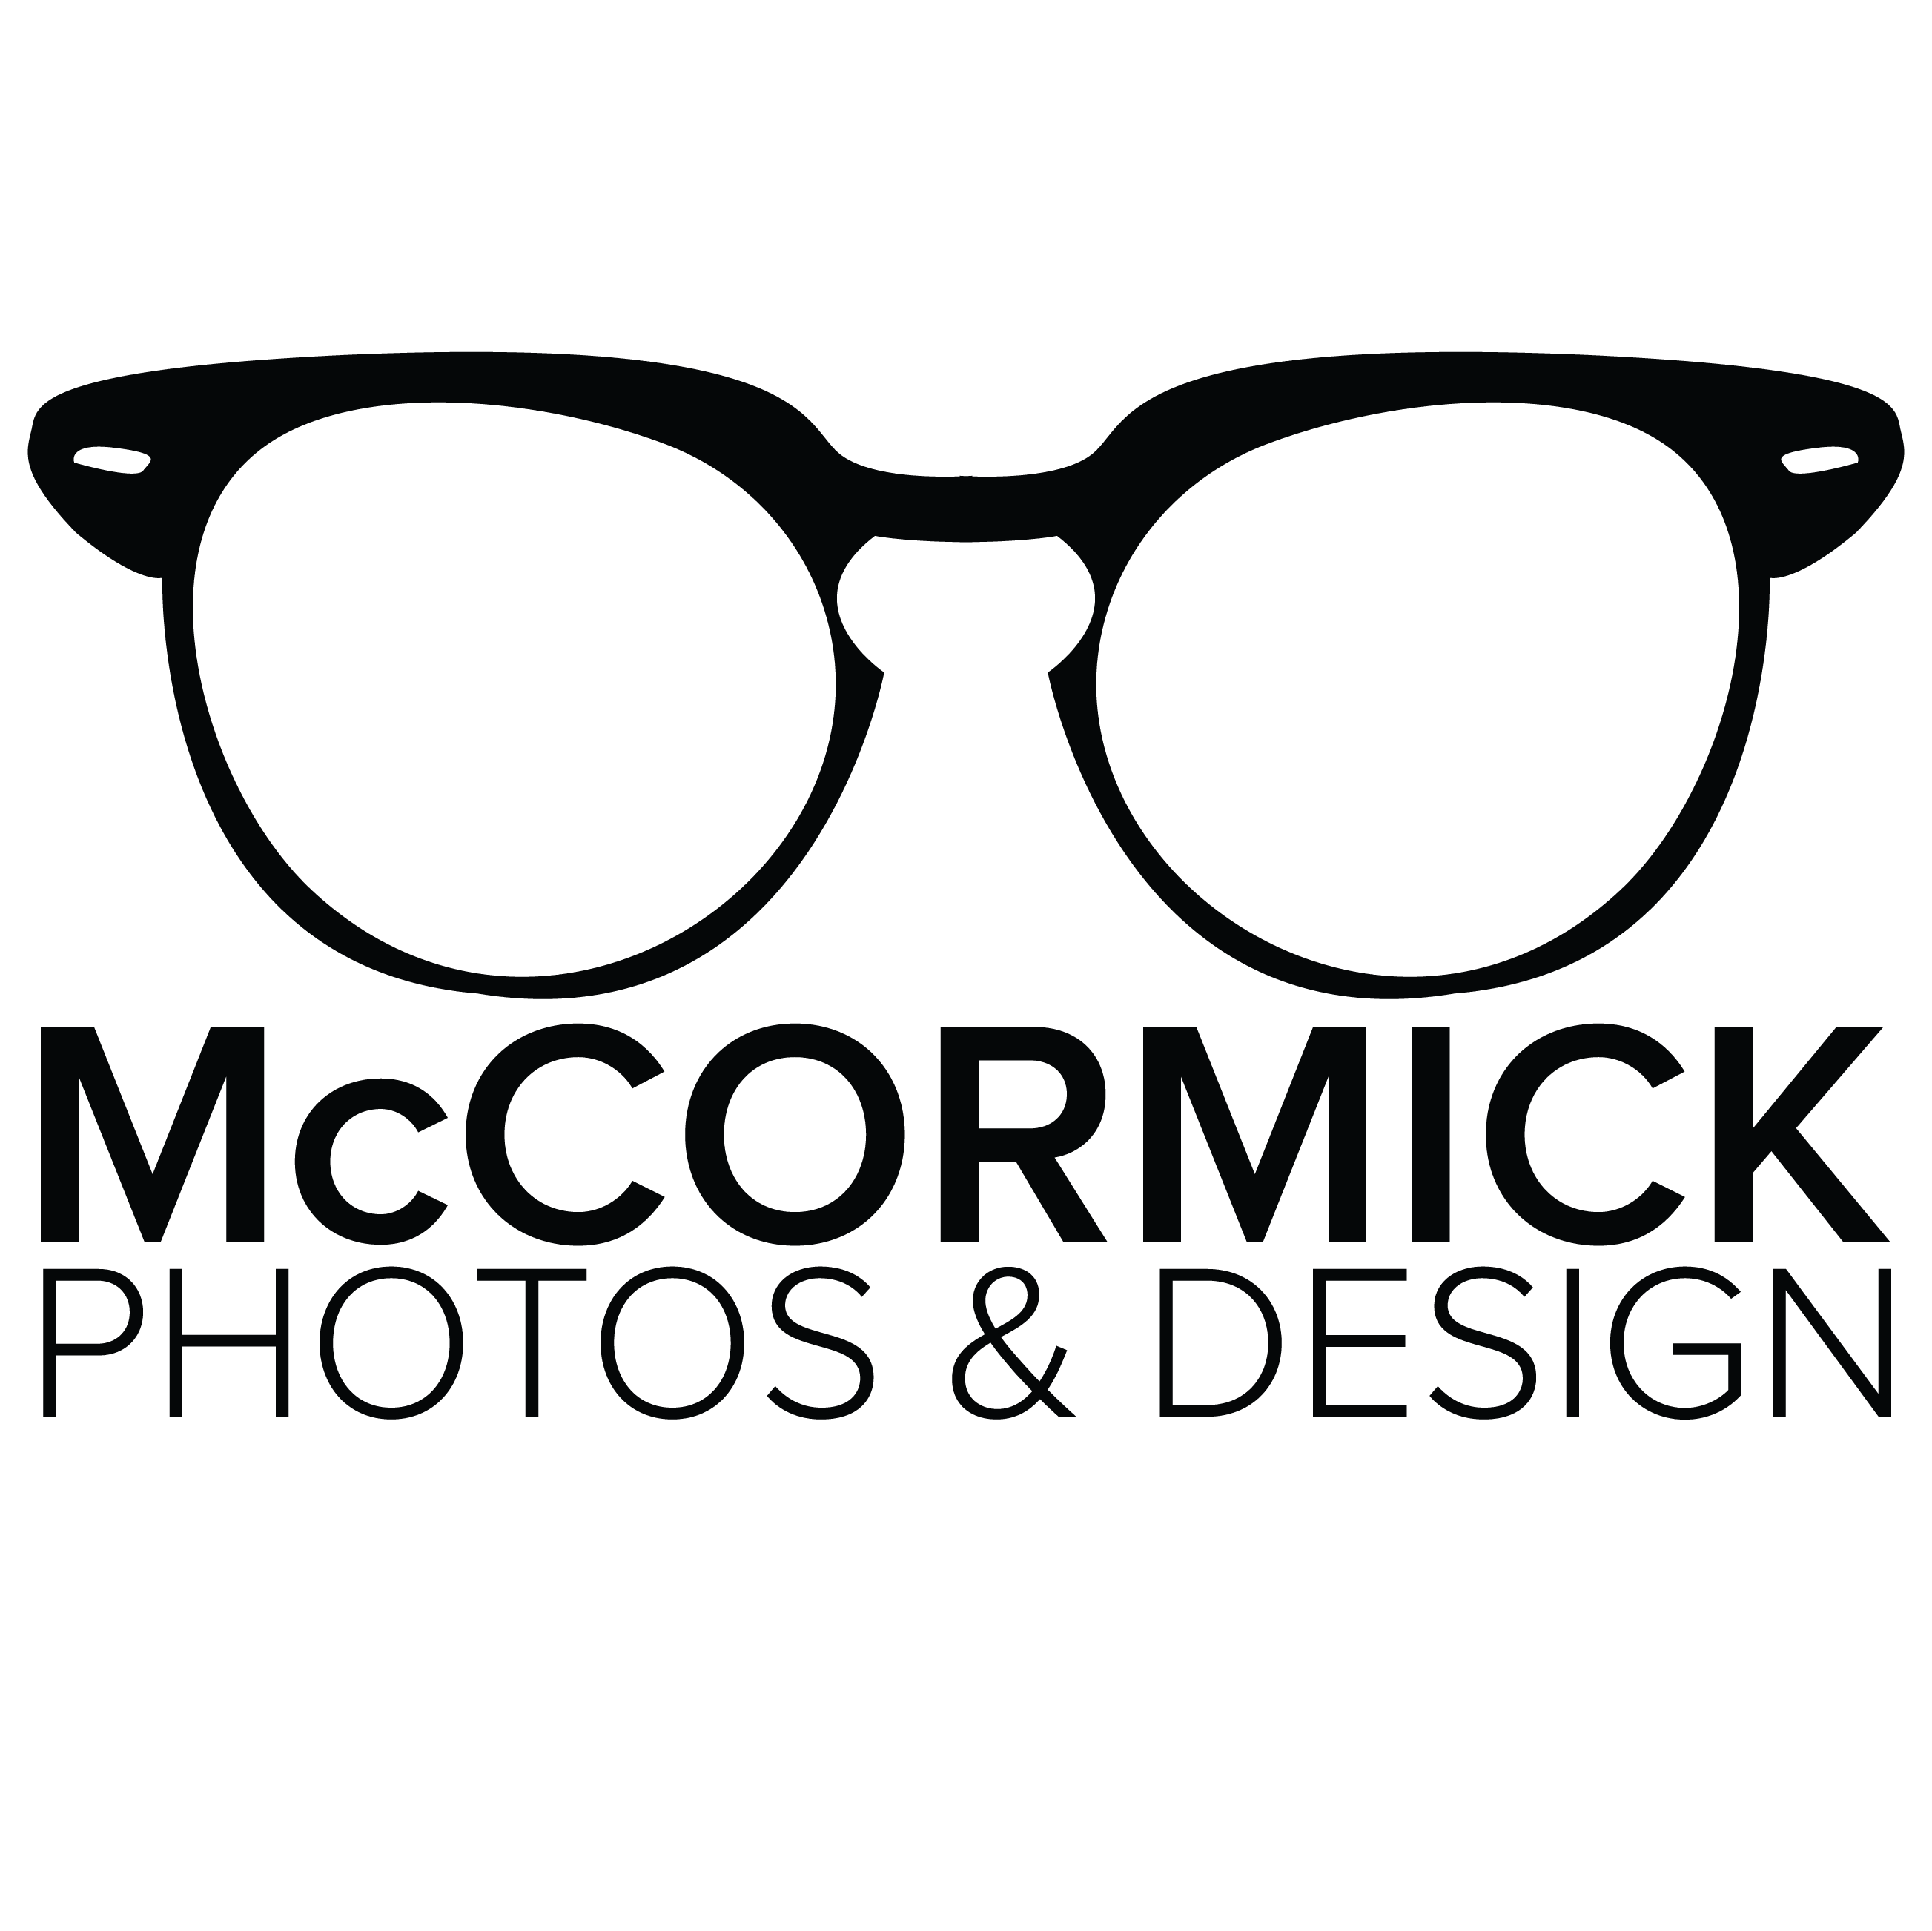 McCormick Photos & Design